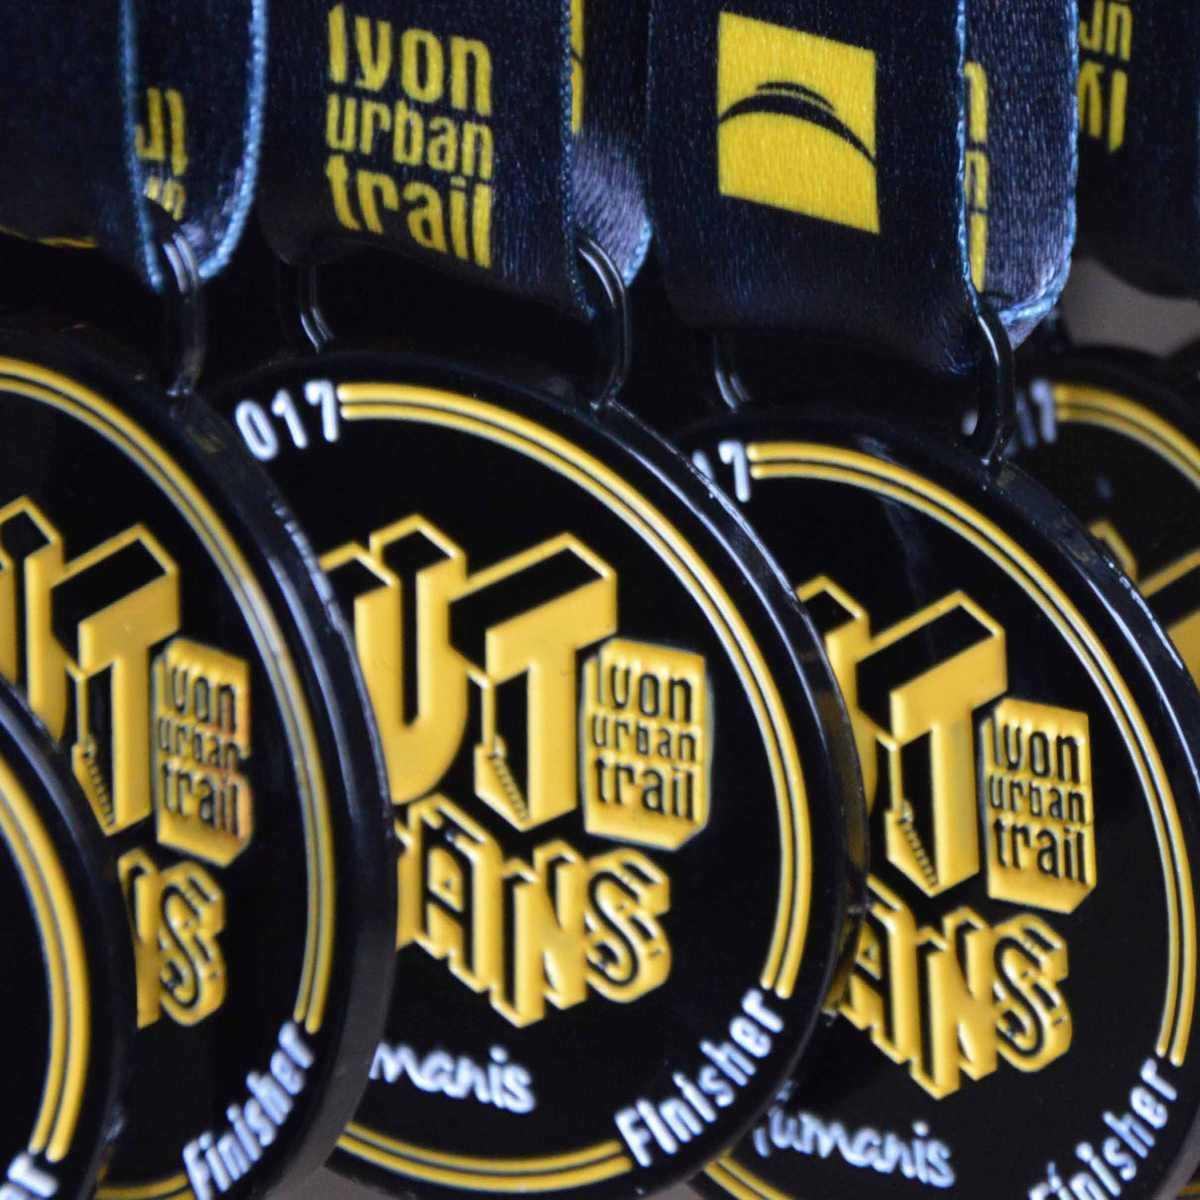 Médaille finisher ronde du Lyon Urban Trail